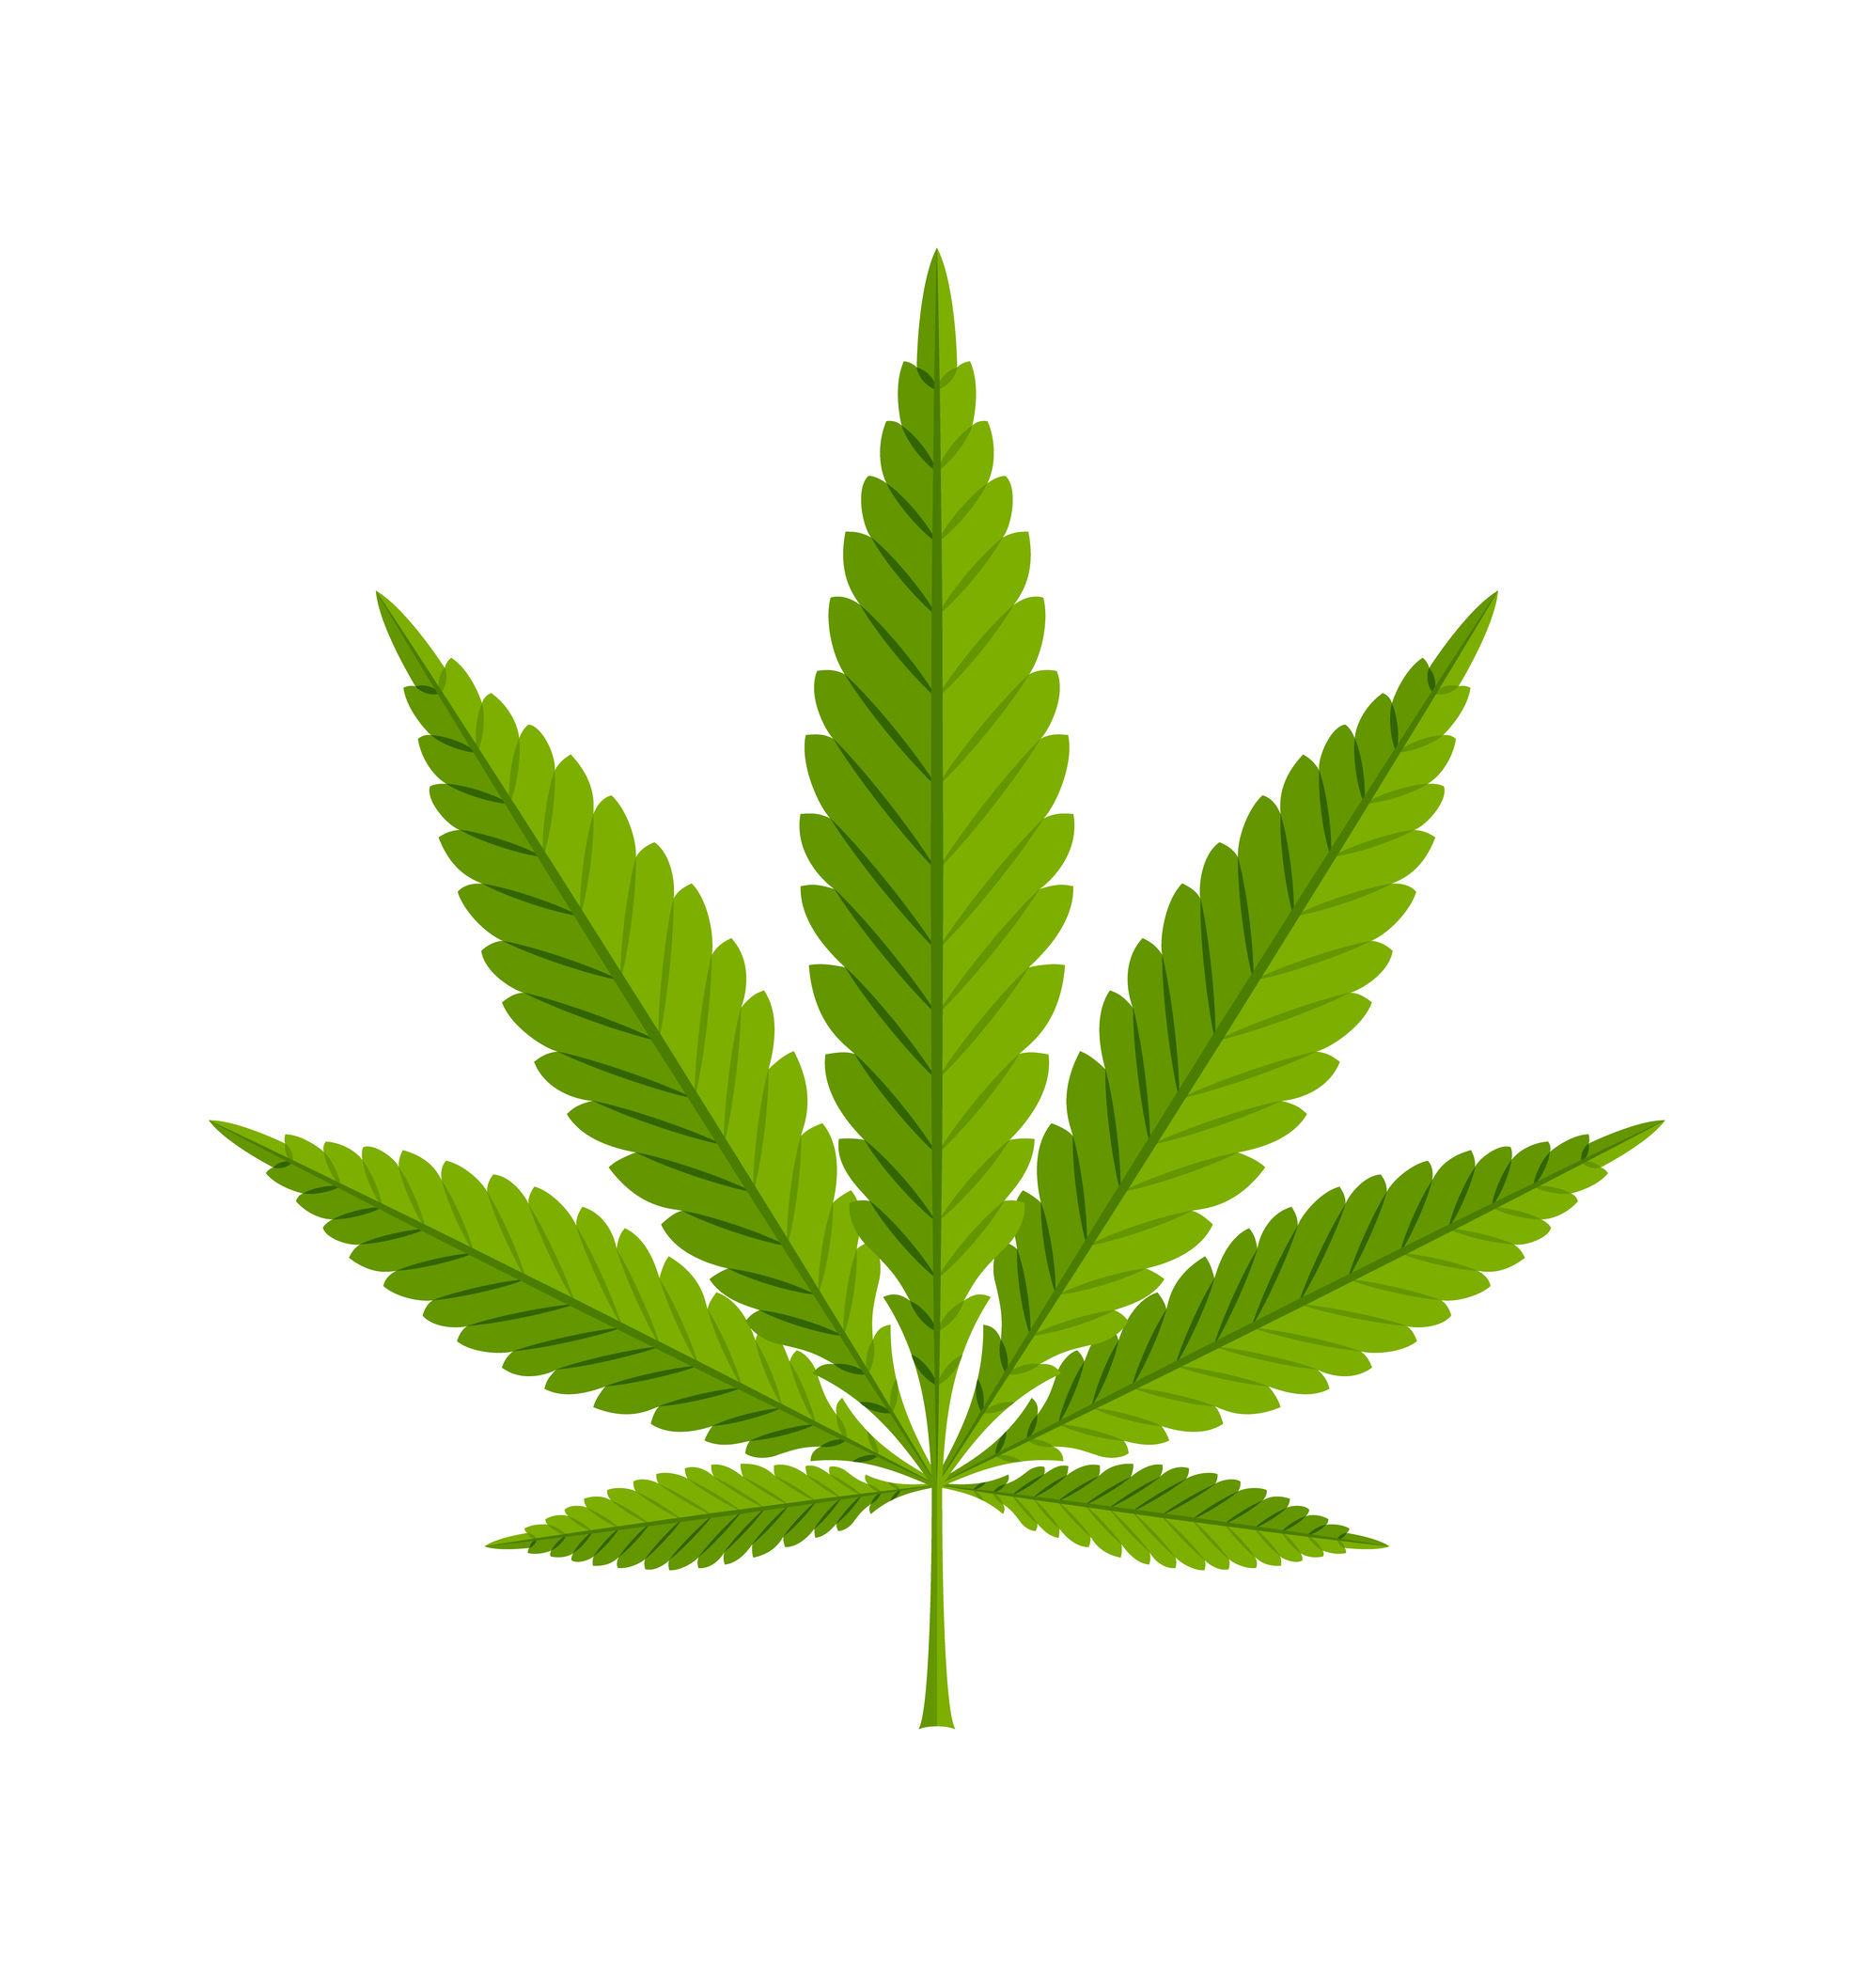 Marijuana hemp leaf on white background